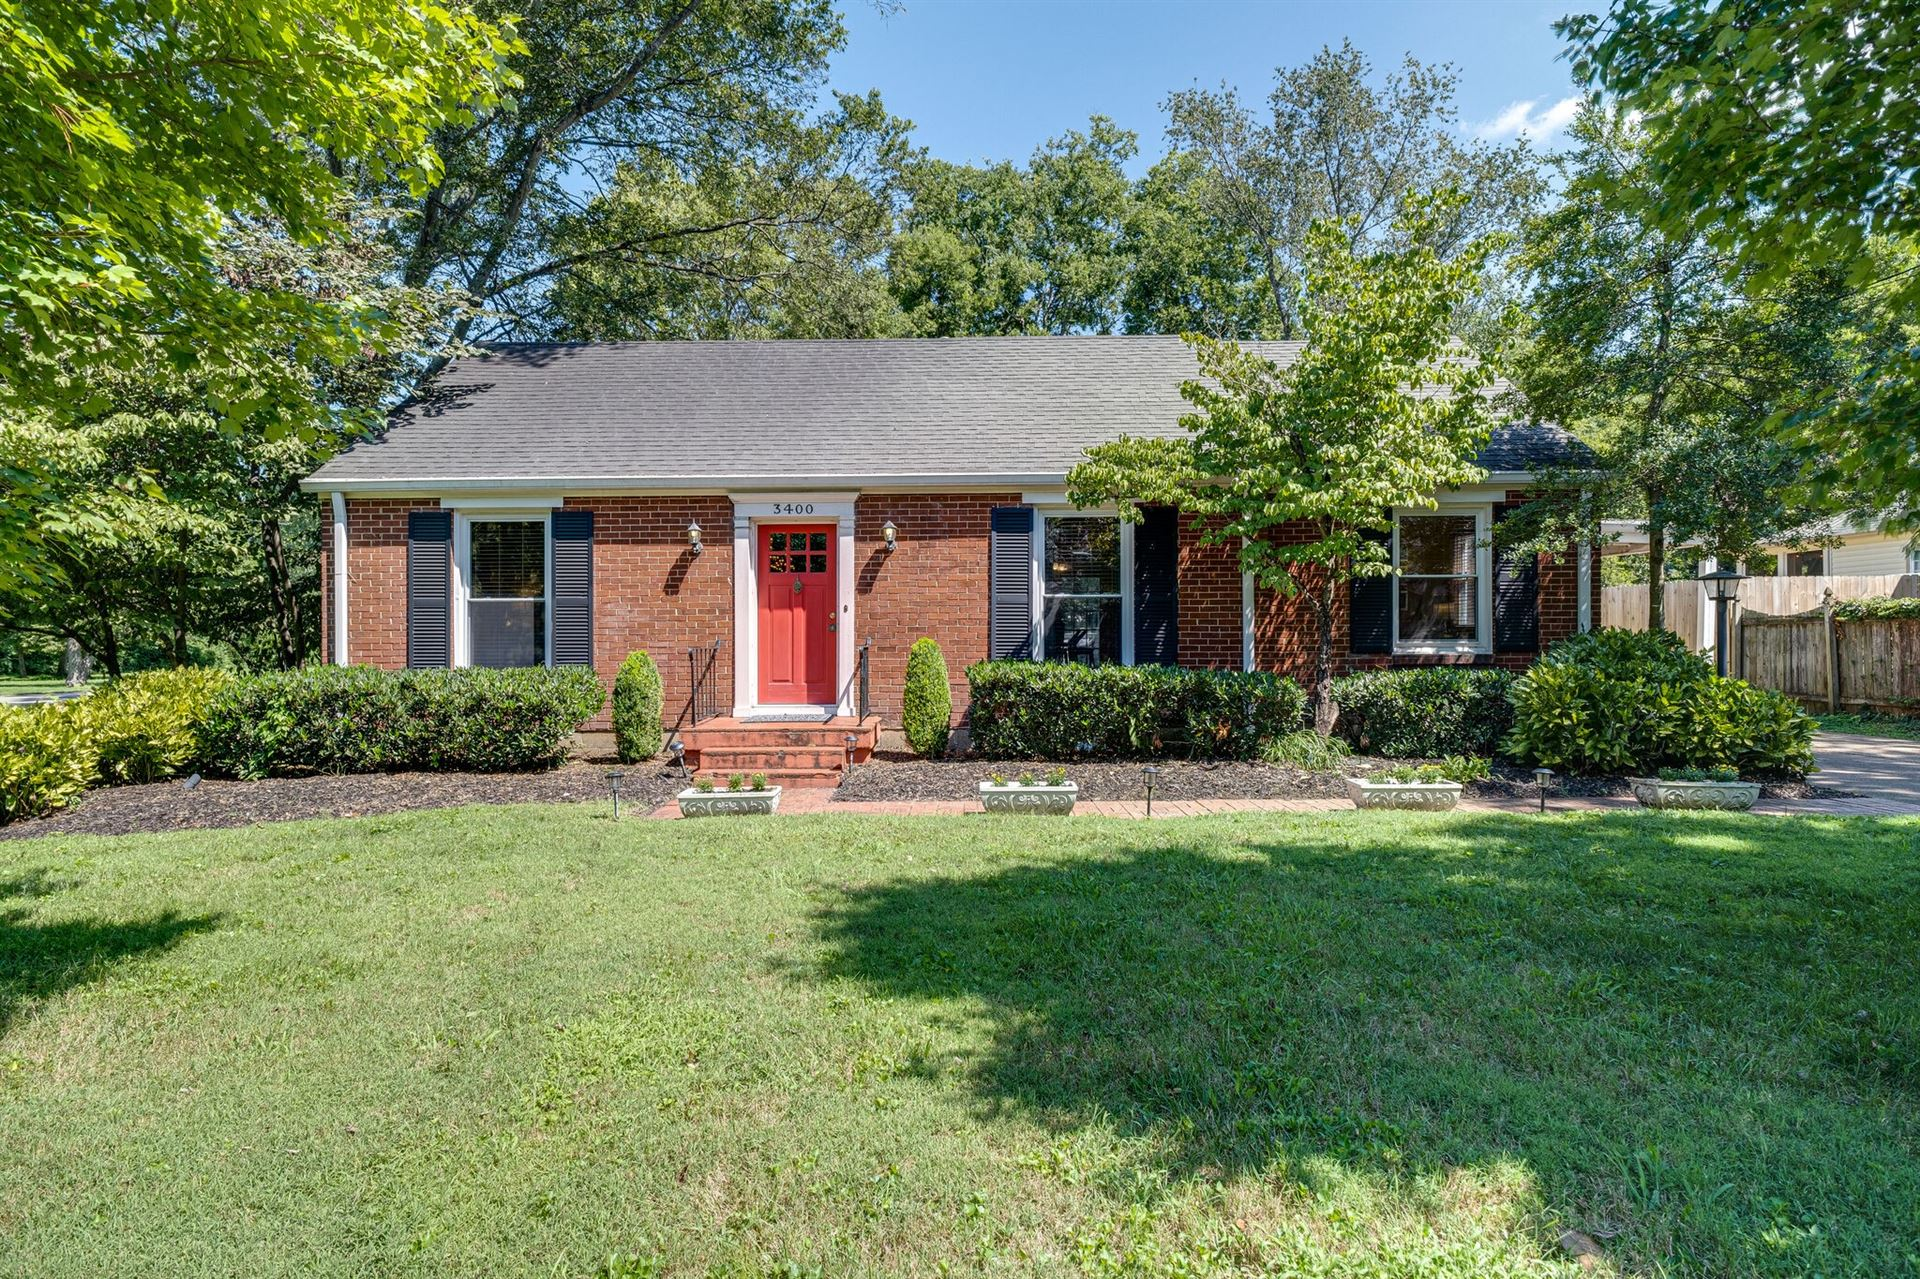 3400 Woodhaven Dr, Nashville, TN 37204 - MLS#: 2288914